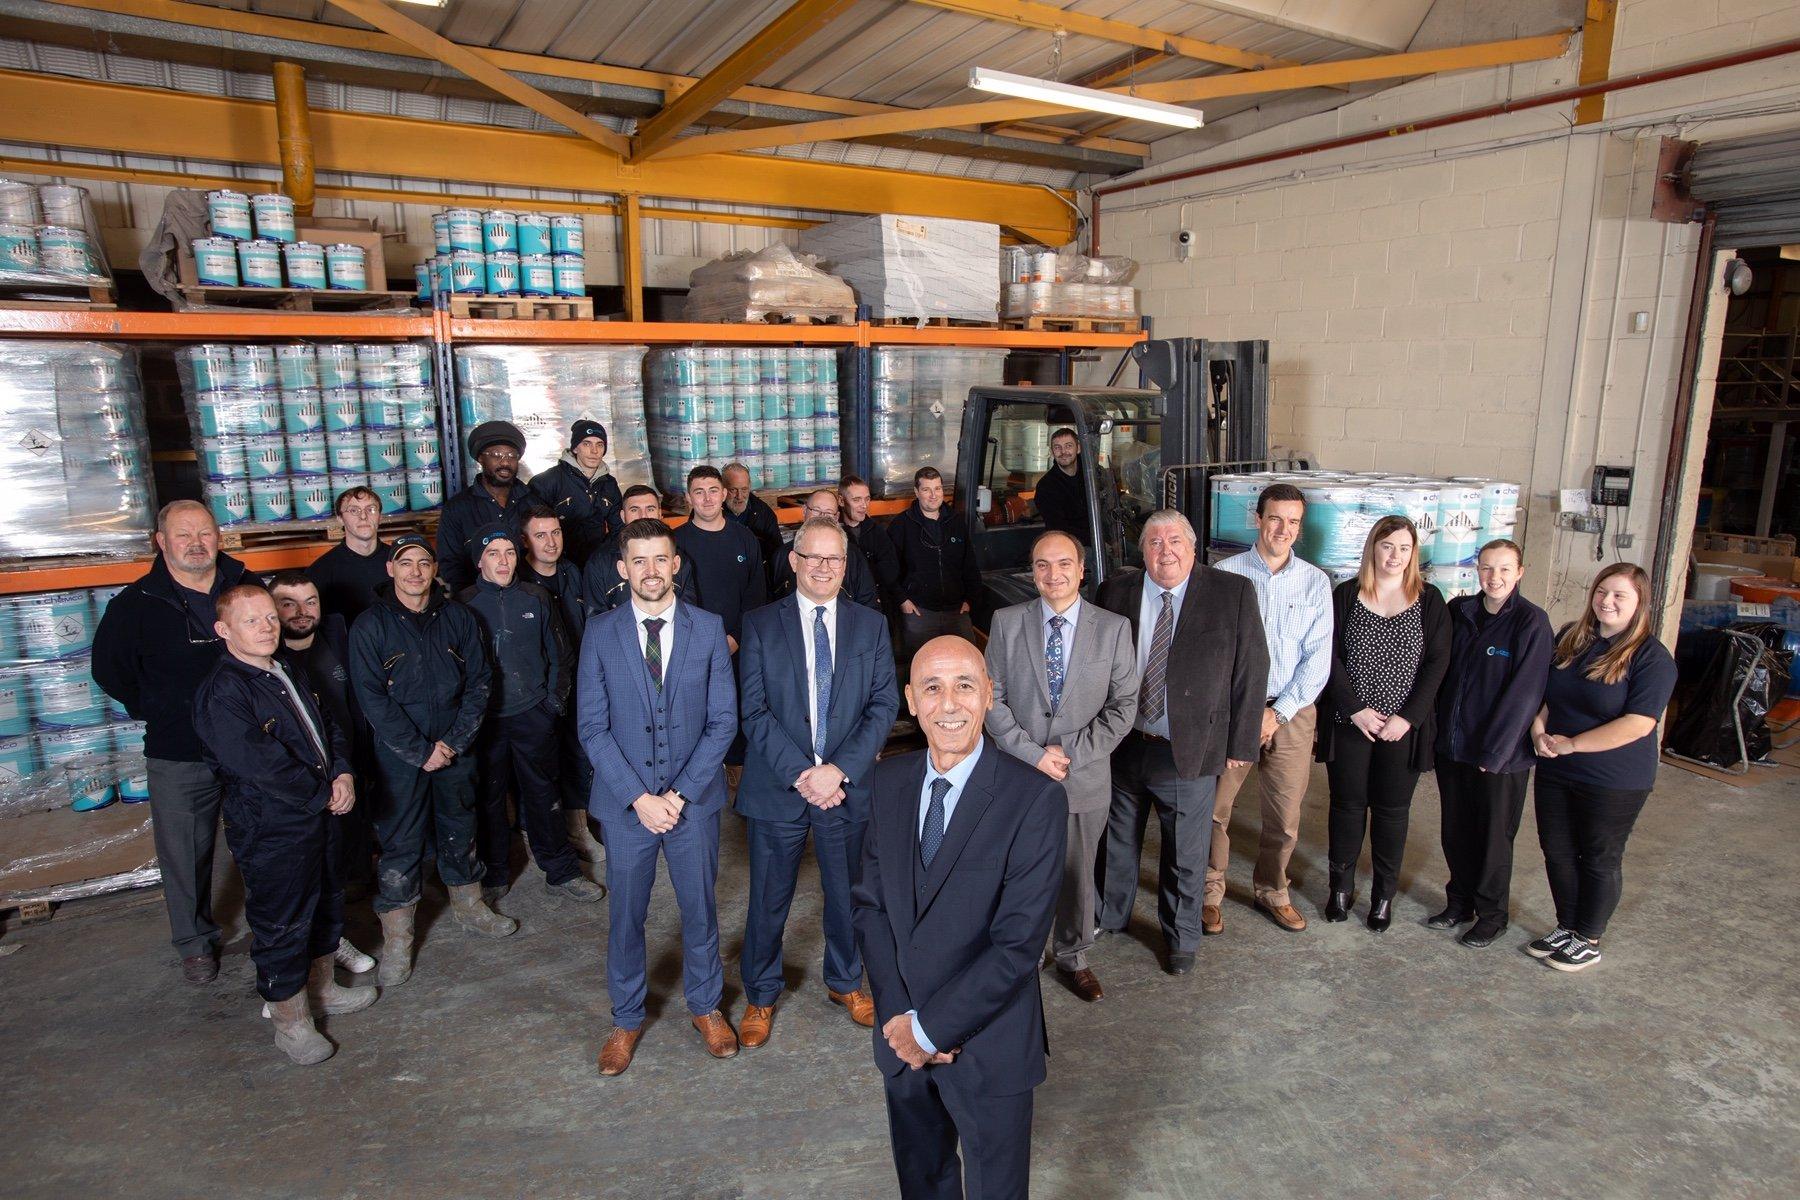 Chemco International, Coatbridge, has moved into employee ownership